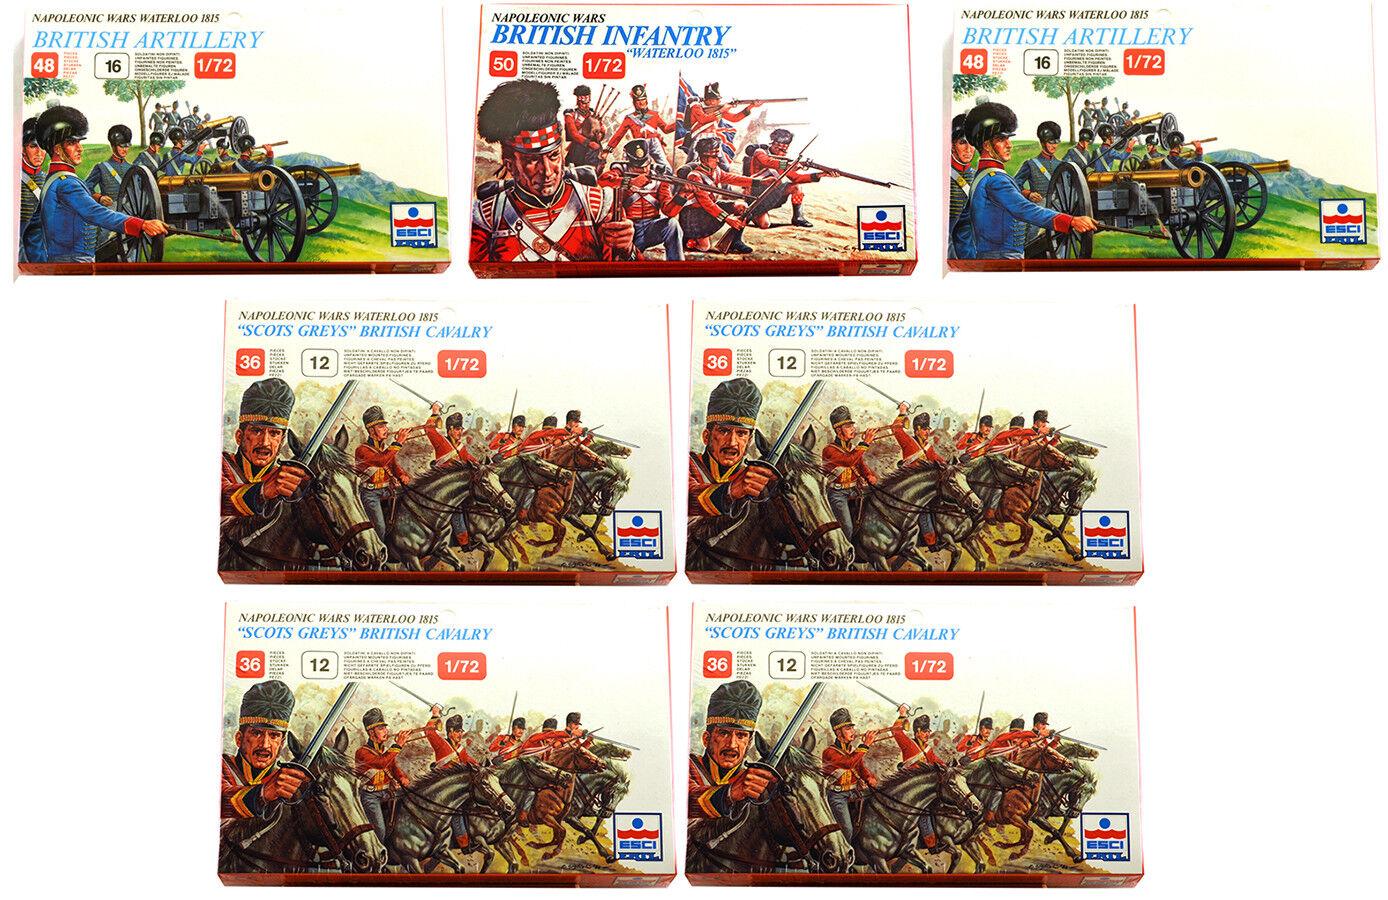 ESCI ERTL 1 72 scale Napoleonic British Bundle - 7 mib sets a  124 value